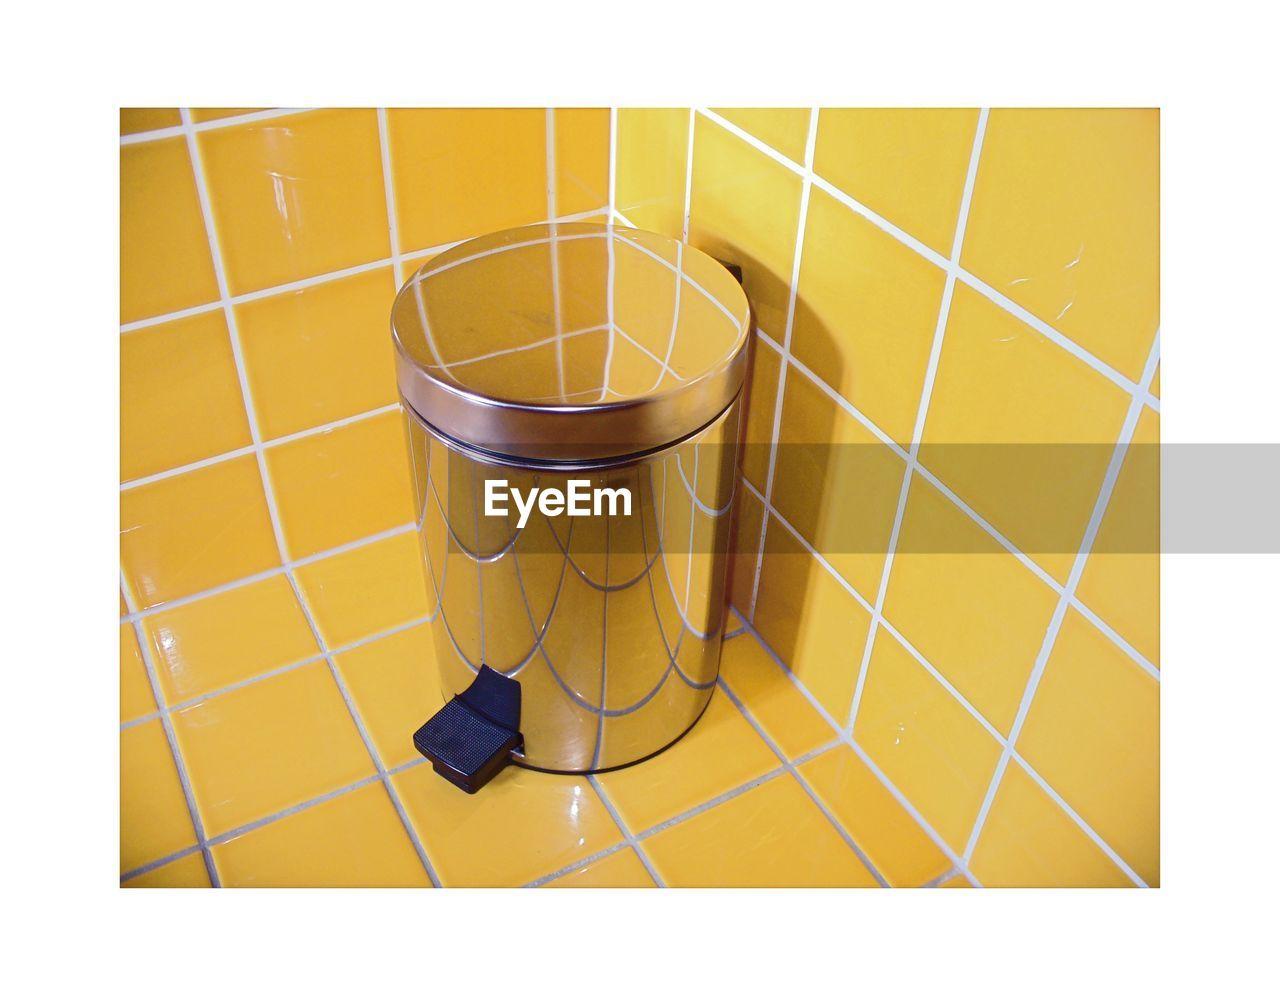 At Home Trash Bin Ashtray  Bathroom Chrome Garbage Can Waste Bin Yellow Color